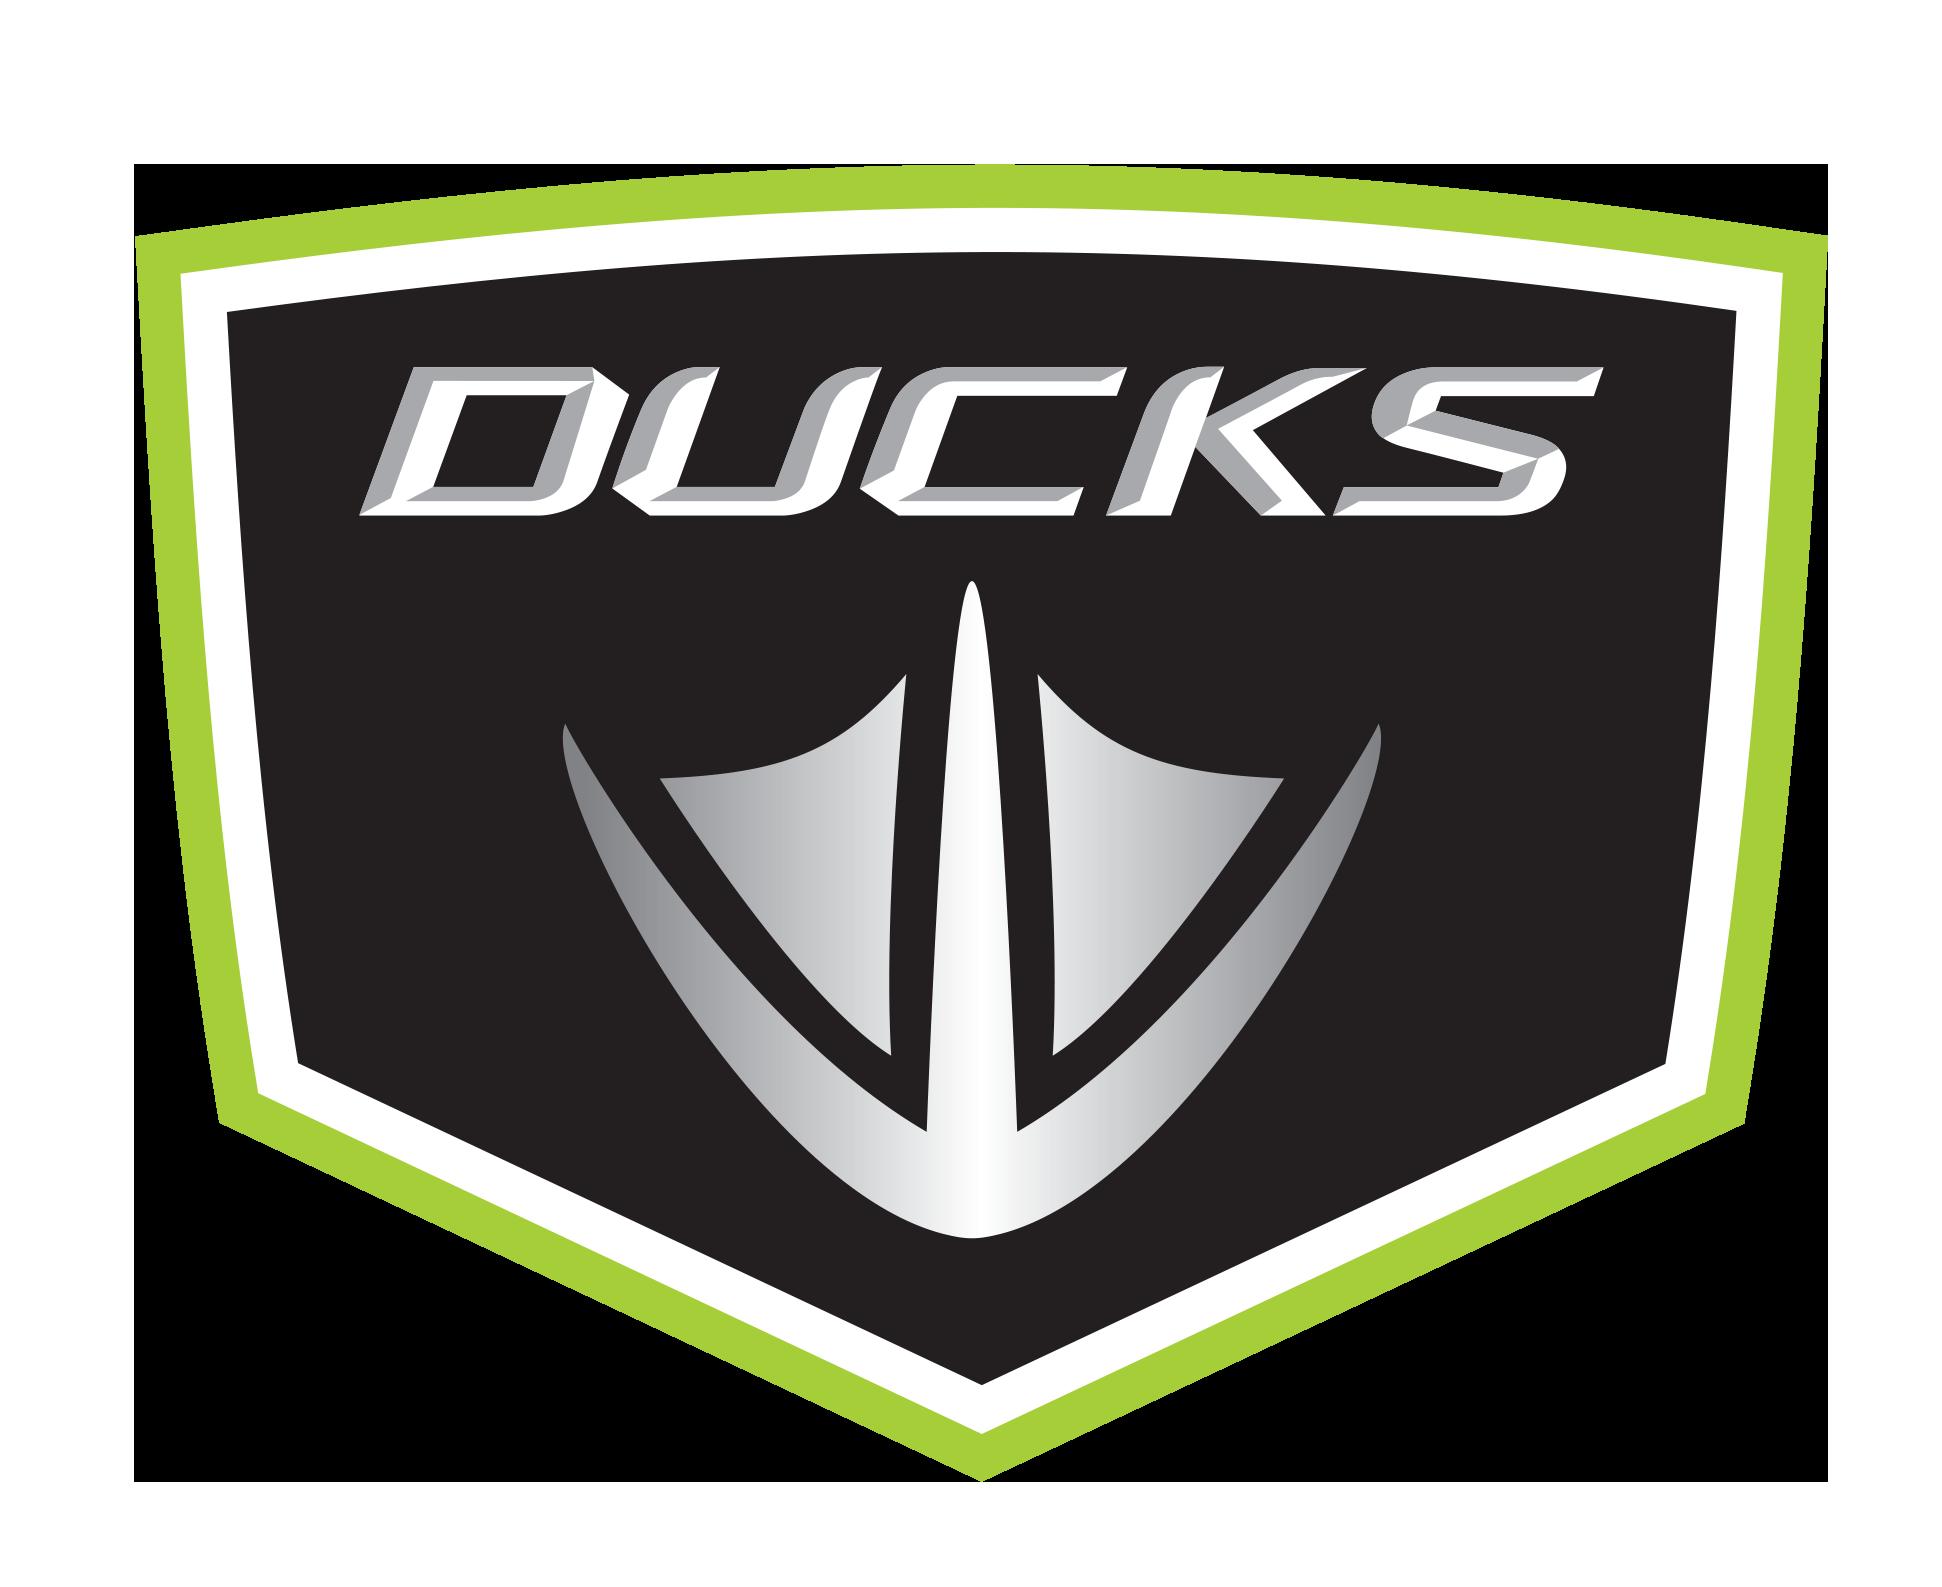 https://tnxlacademy.com/wp-content/uploads/2019/11/ducks-shield.png